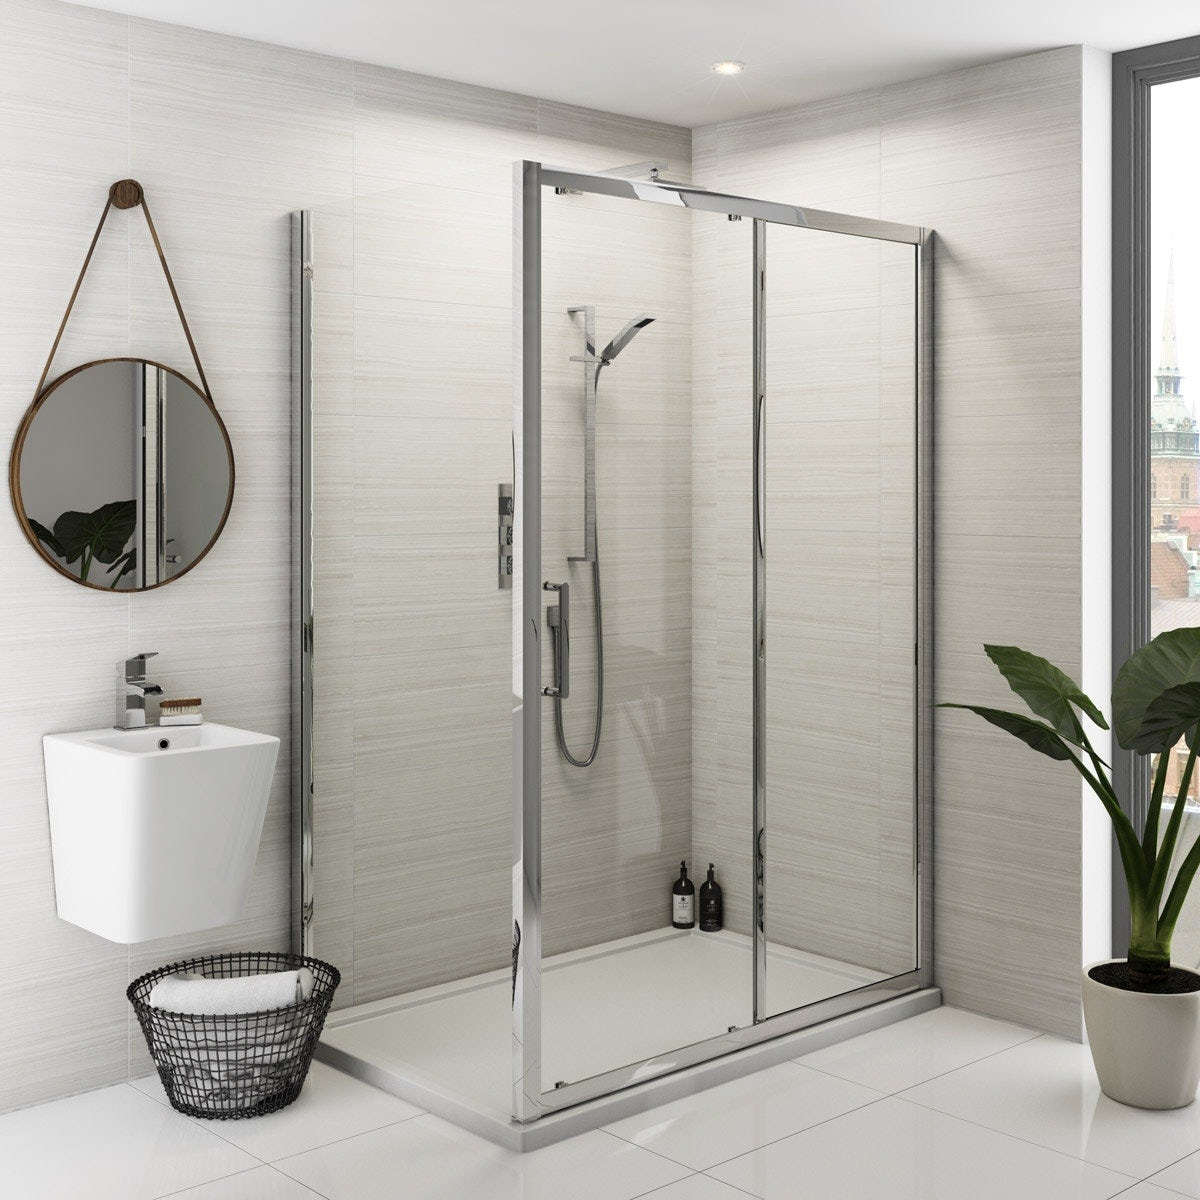 Bathroom suites with shower enclosures